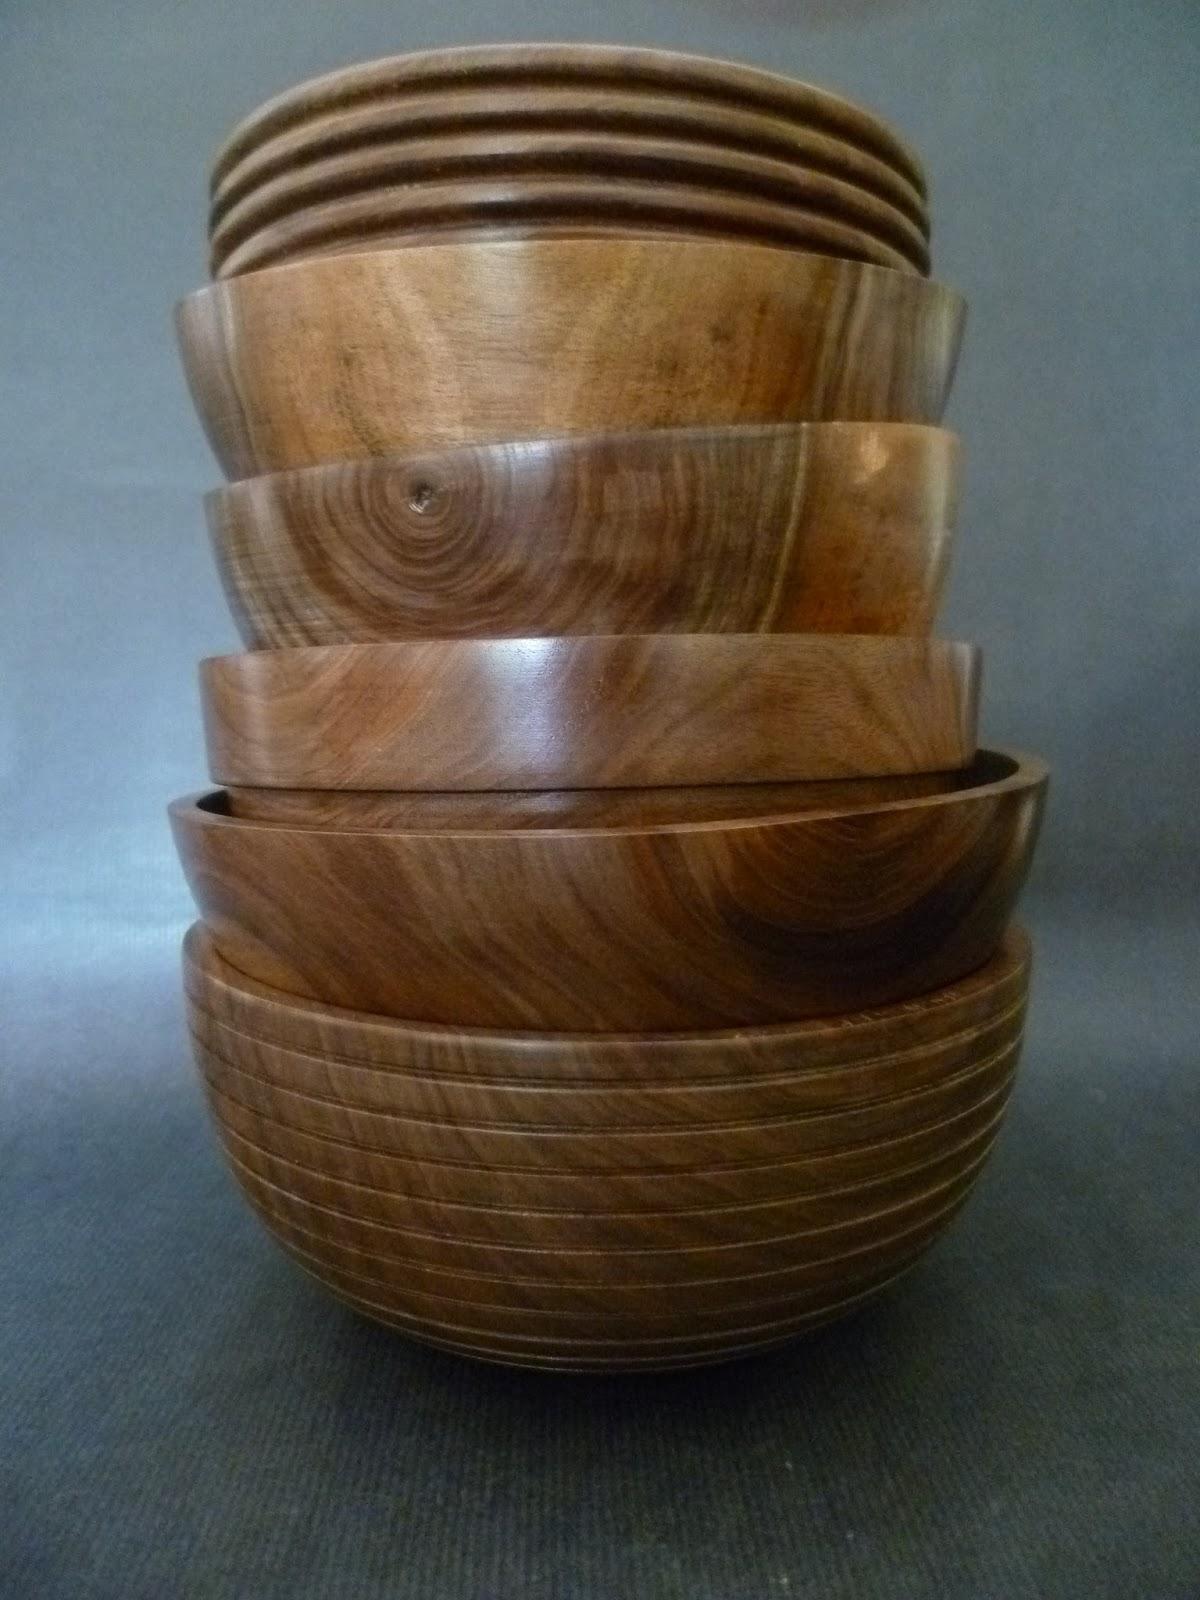 atelier du bois tourn woodturning design six bols en noyer noir d 39 am rique. Black Bedroom Furniture Sets. Home Design Ideas